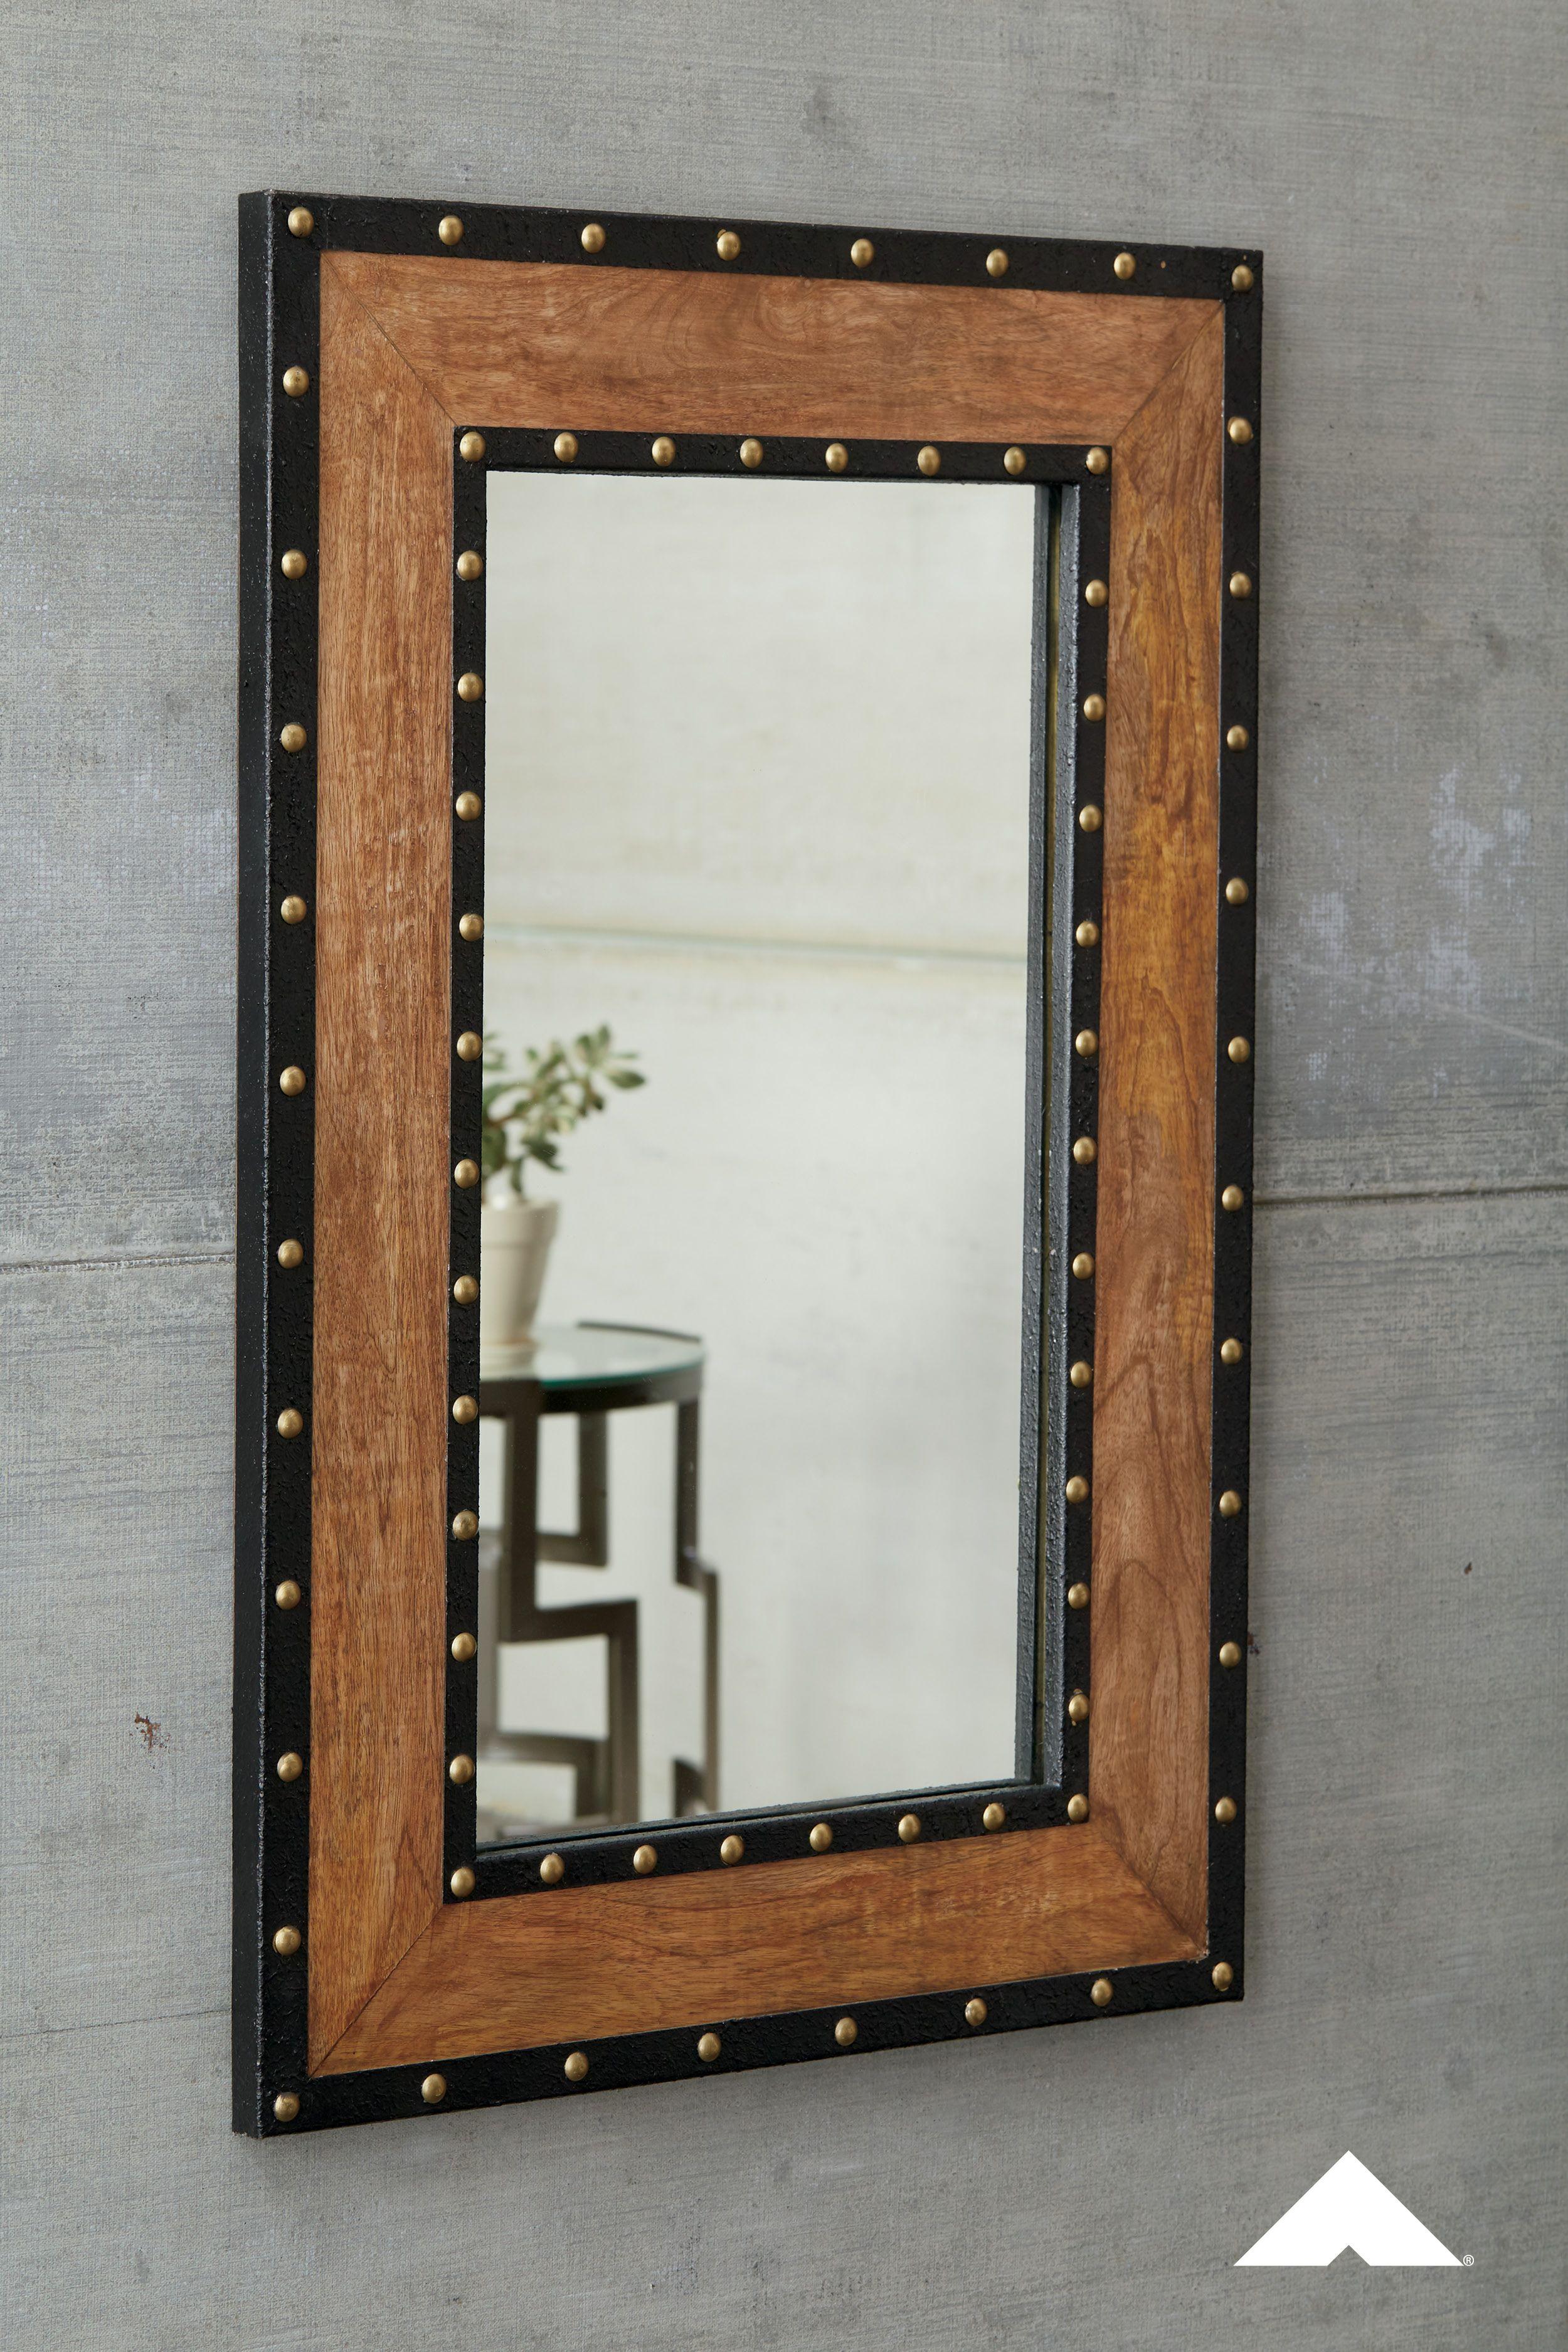 Dulcina Natural Accent Mirror Made Of Burnt Wood Dulcina Accent